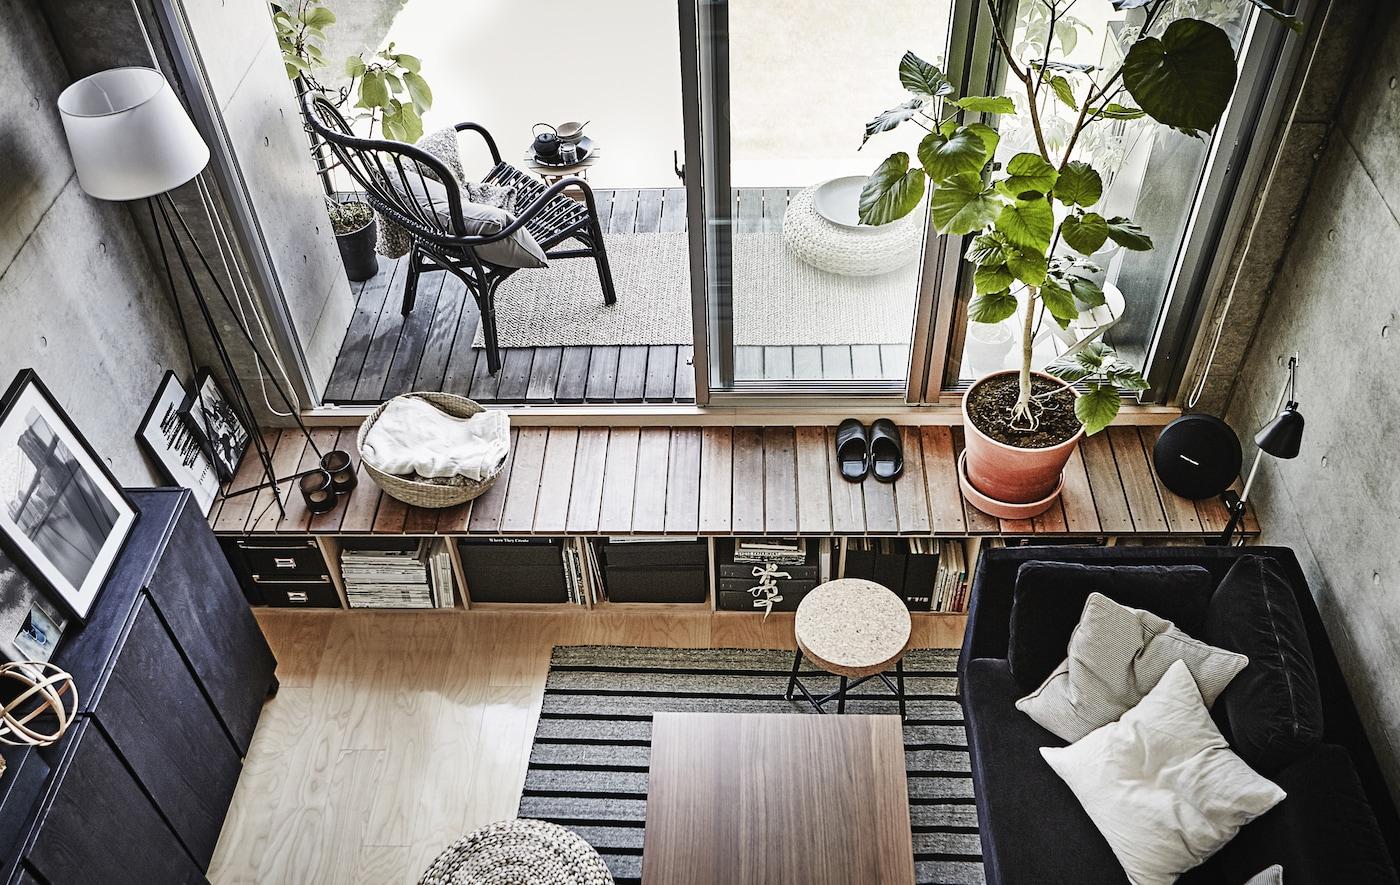 kleine r ume clever nutzen ikea ikea. Black Bedroom Furniture Sets. Home Design Ideas